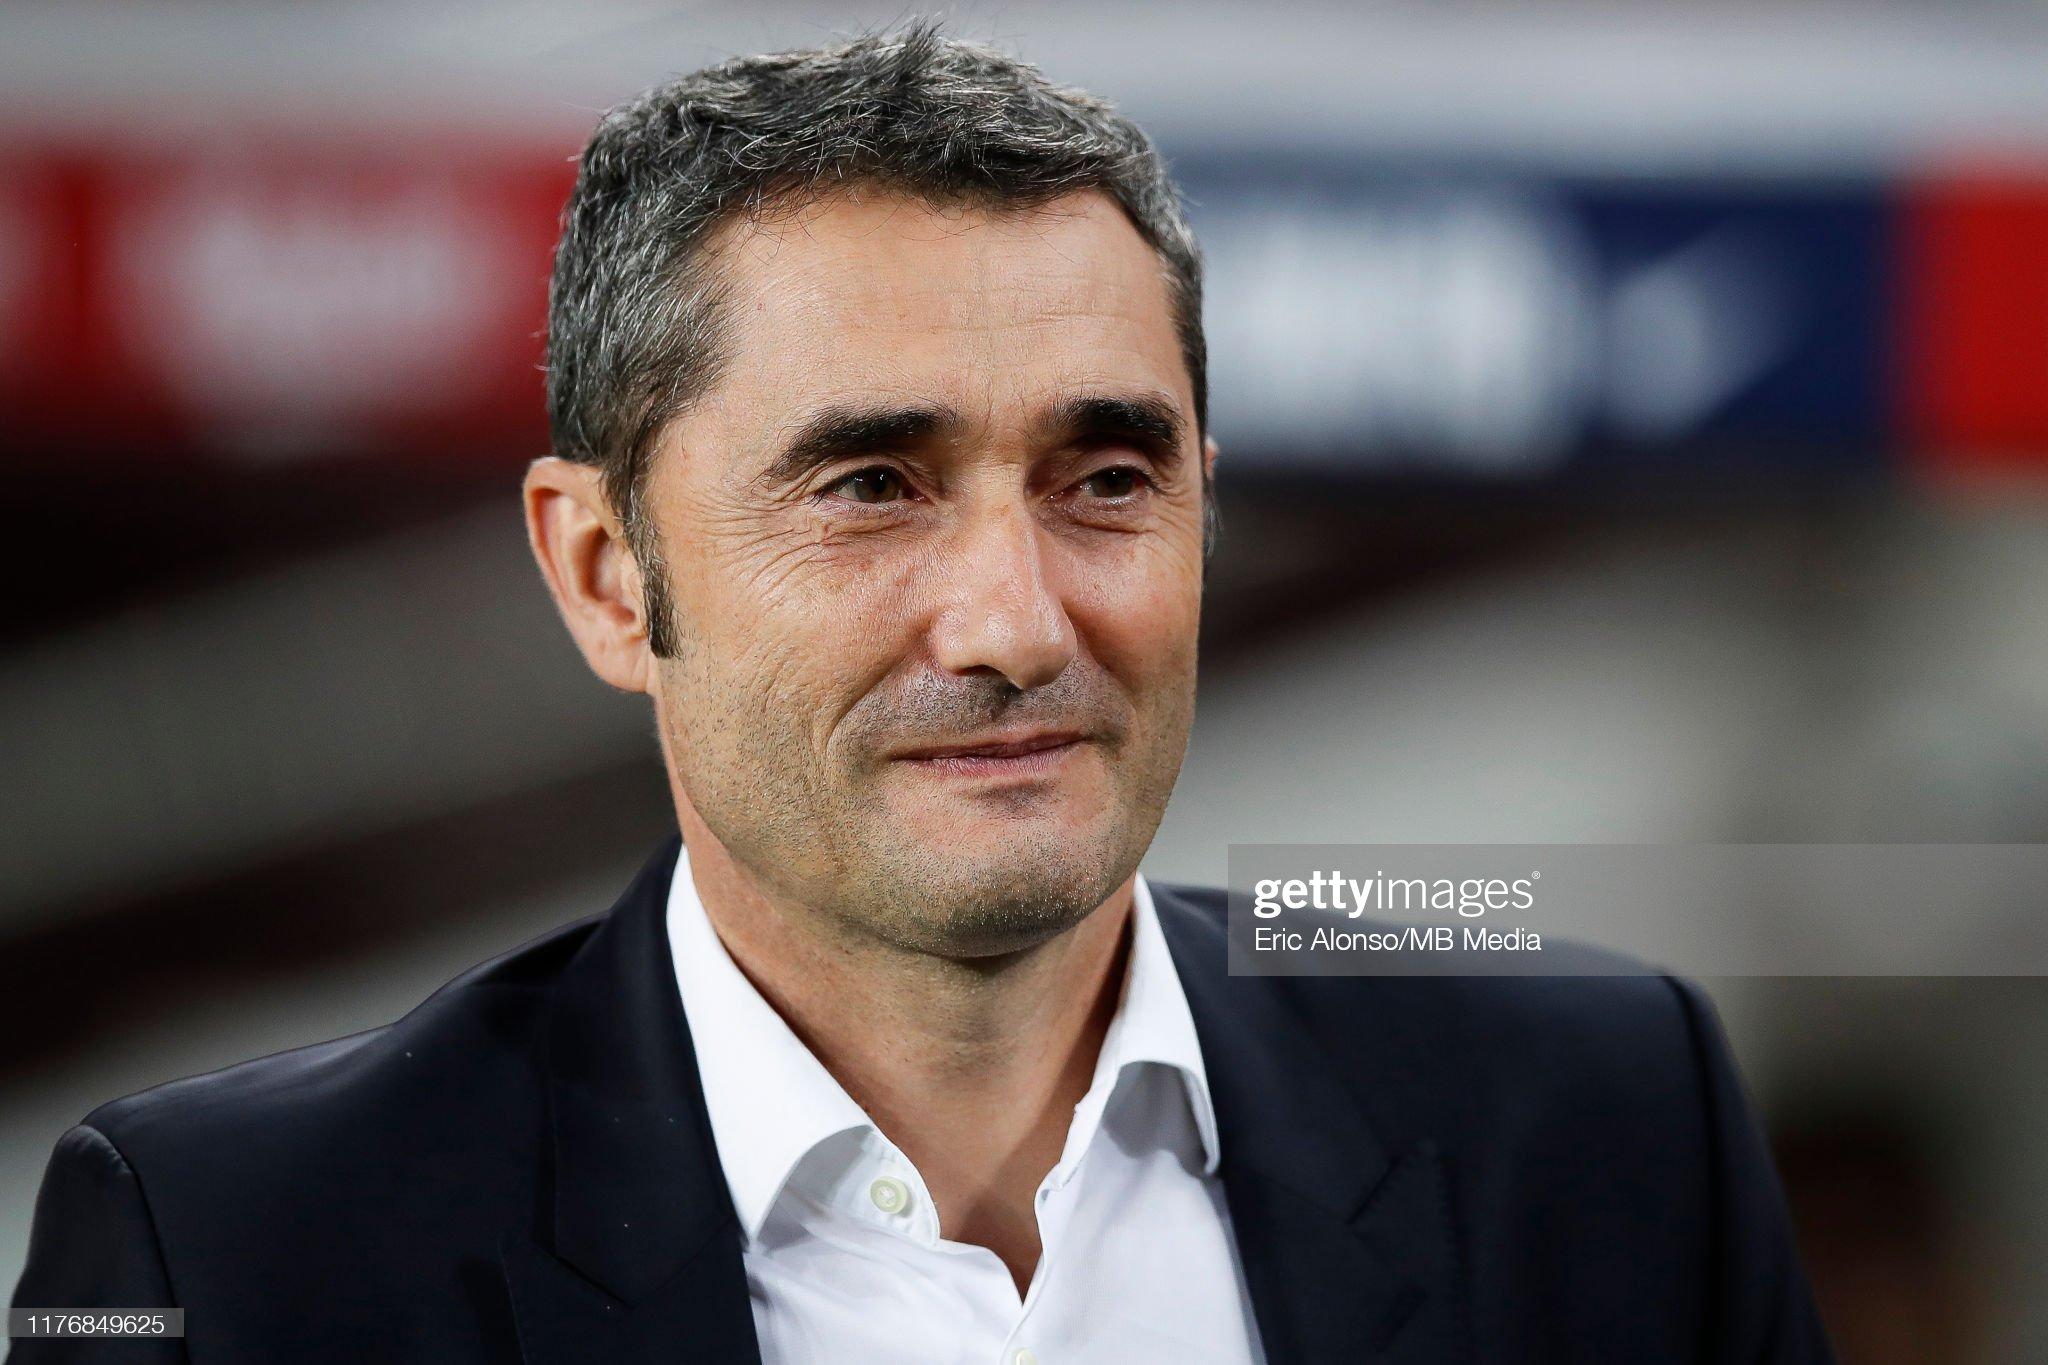 صور مباراة : برشلونة - فياريال 2-1 ( 24-09-2019 )  Ernesto-valverde-walks-before-start-the-liga-match-between-fc-and-picture-id1176849625?s=2048x2048